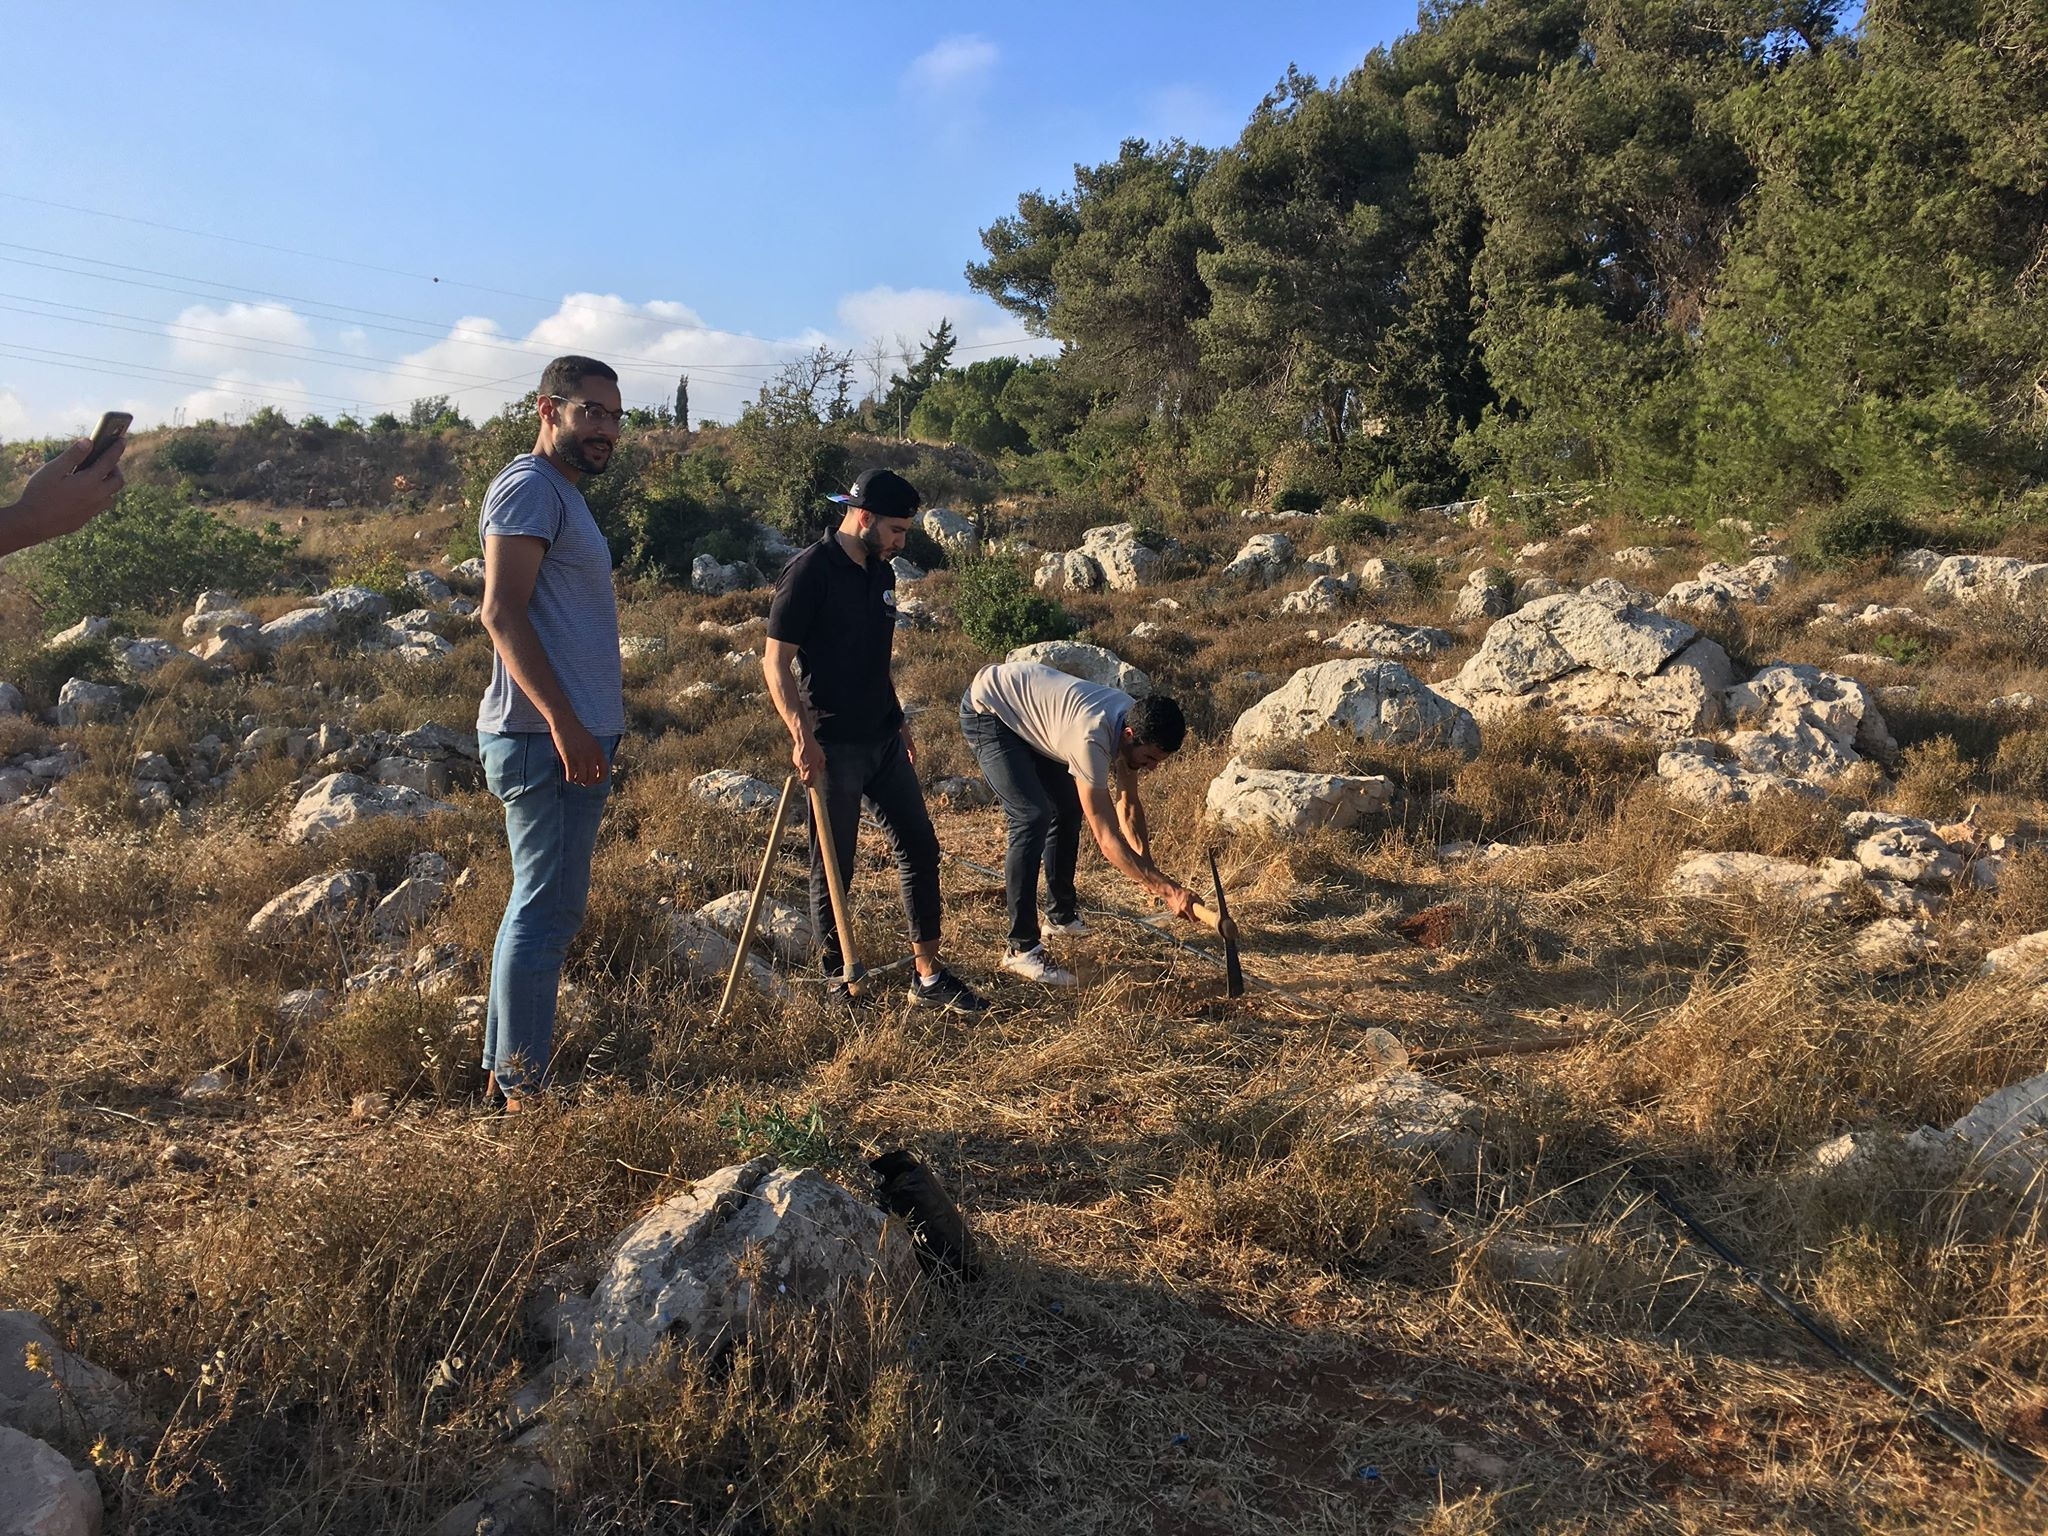 Mustafa, Wissam en Adel planten 55 bomen